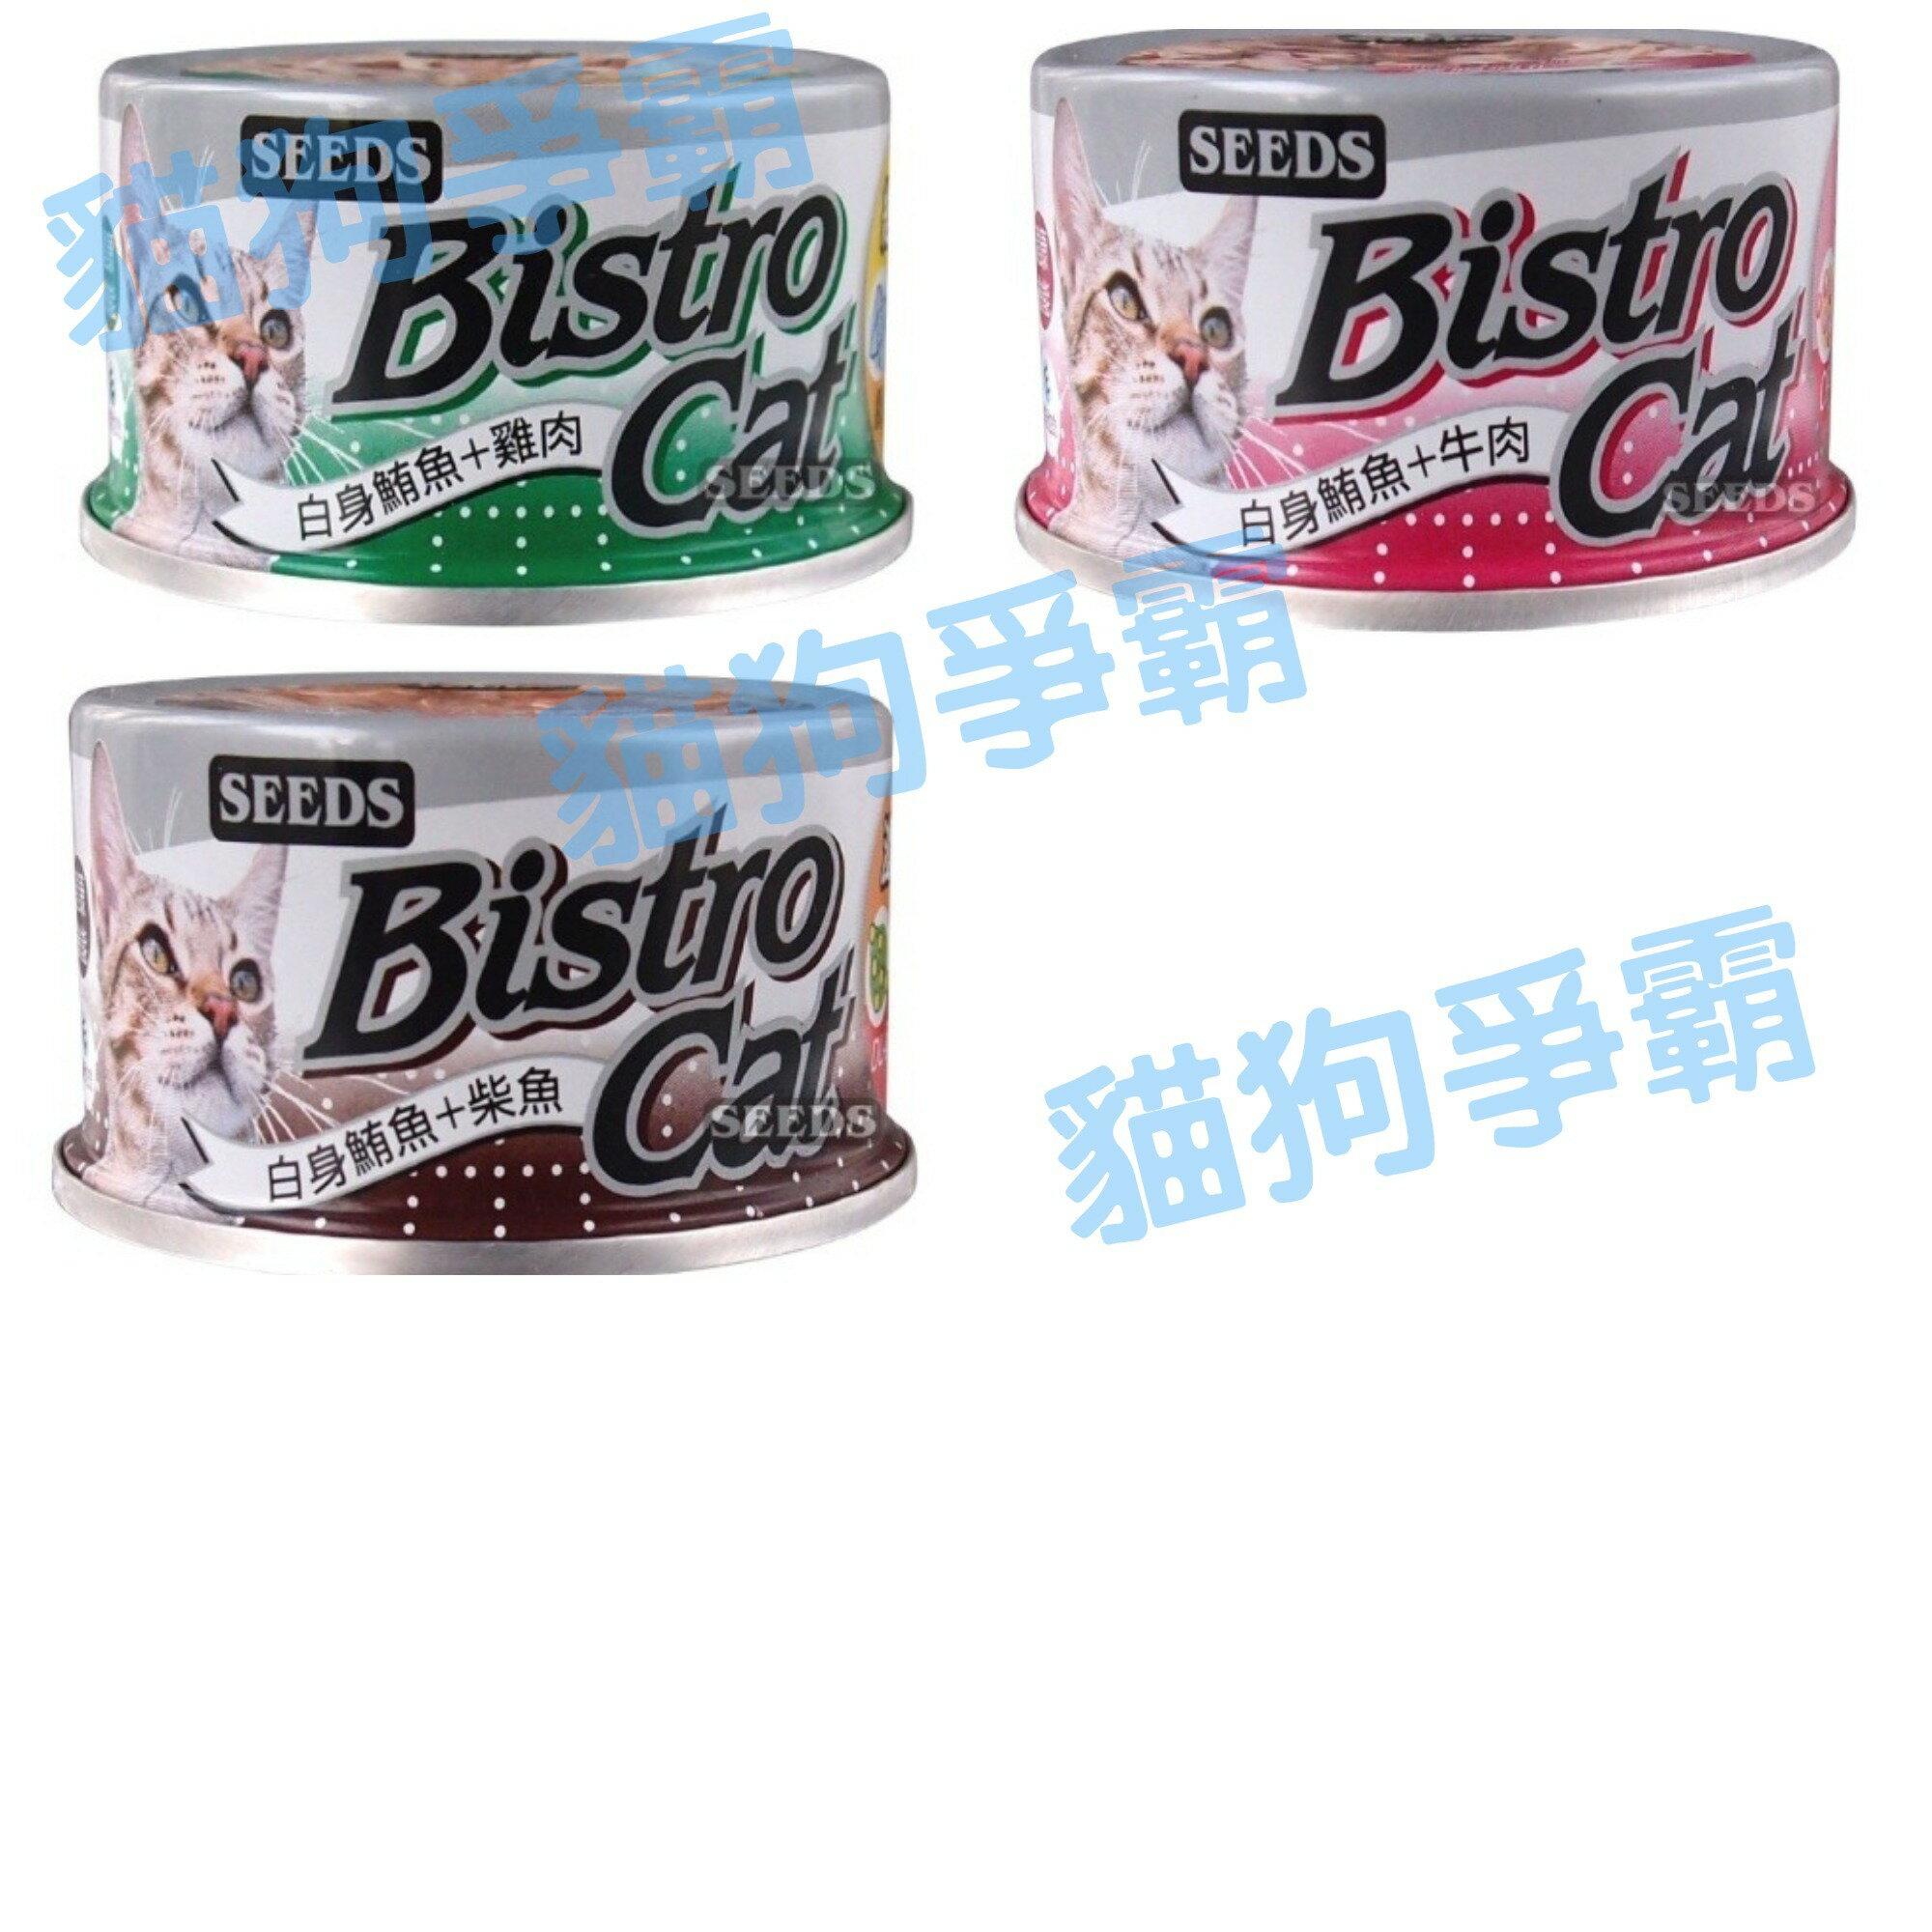 Bistro Cat 特級銀貓罐 SEEDS 惜時 80g 貓罐頭 1